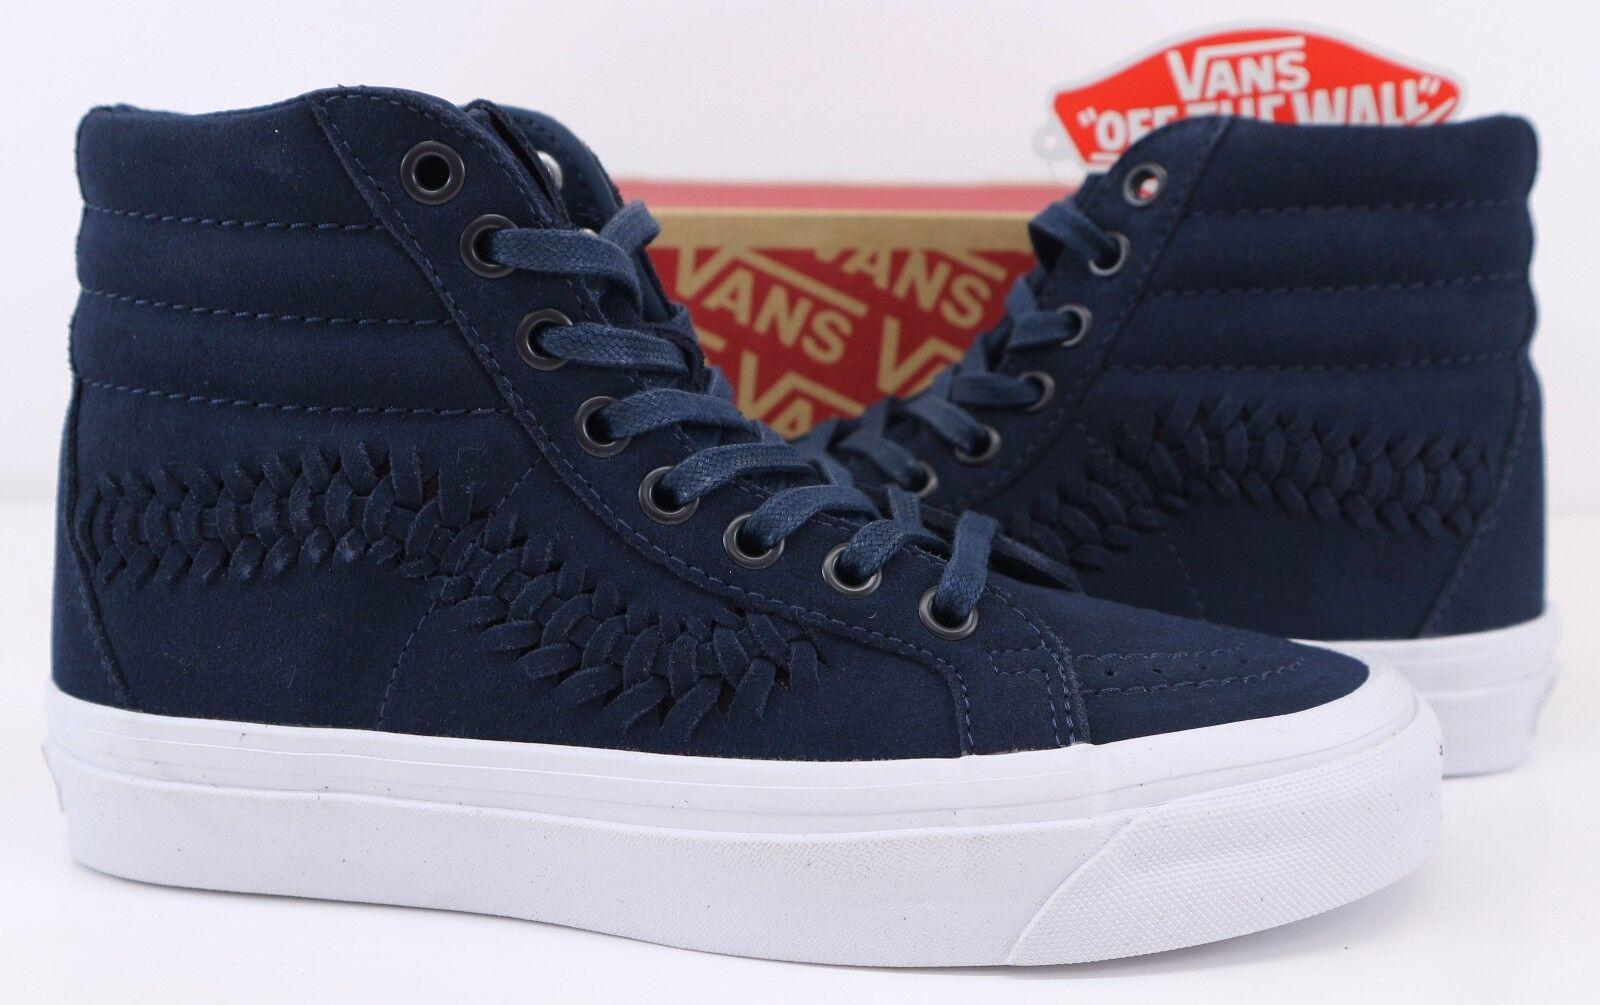 Vans SK8-Hi Weave DX Suede Dress bluee Trainers Sneakers